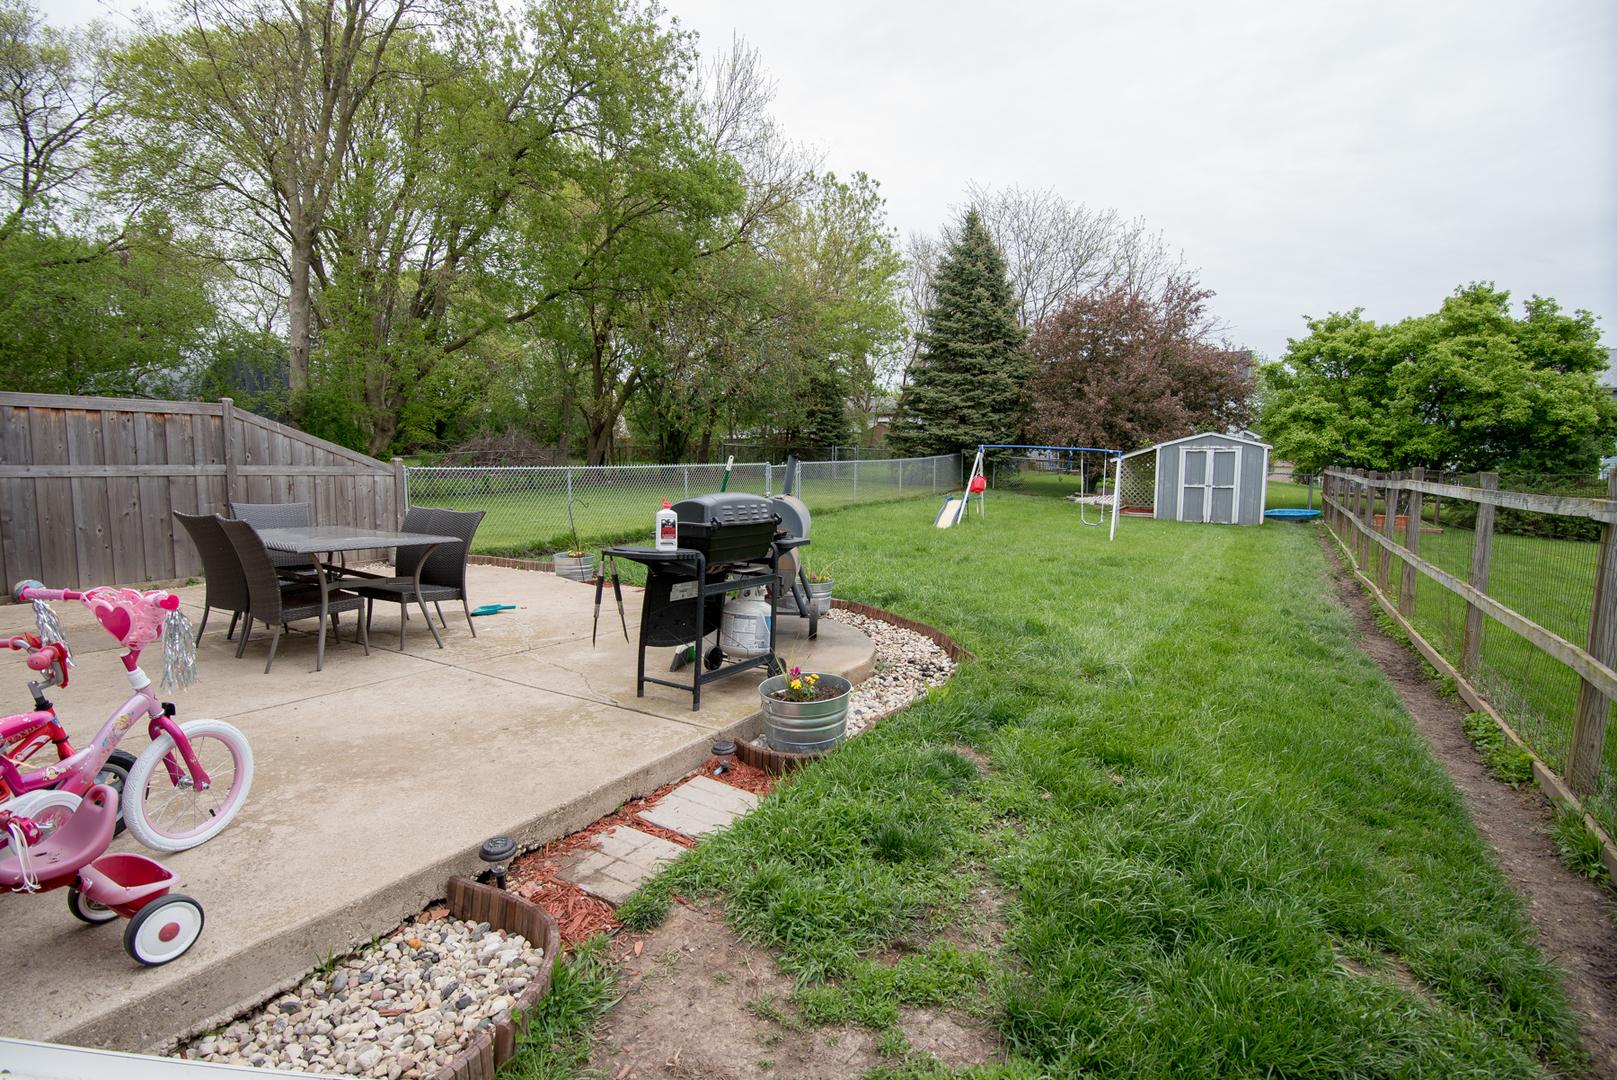 595 DROM, ANTIOCH, Illinois, 60002